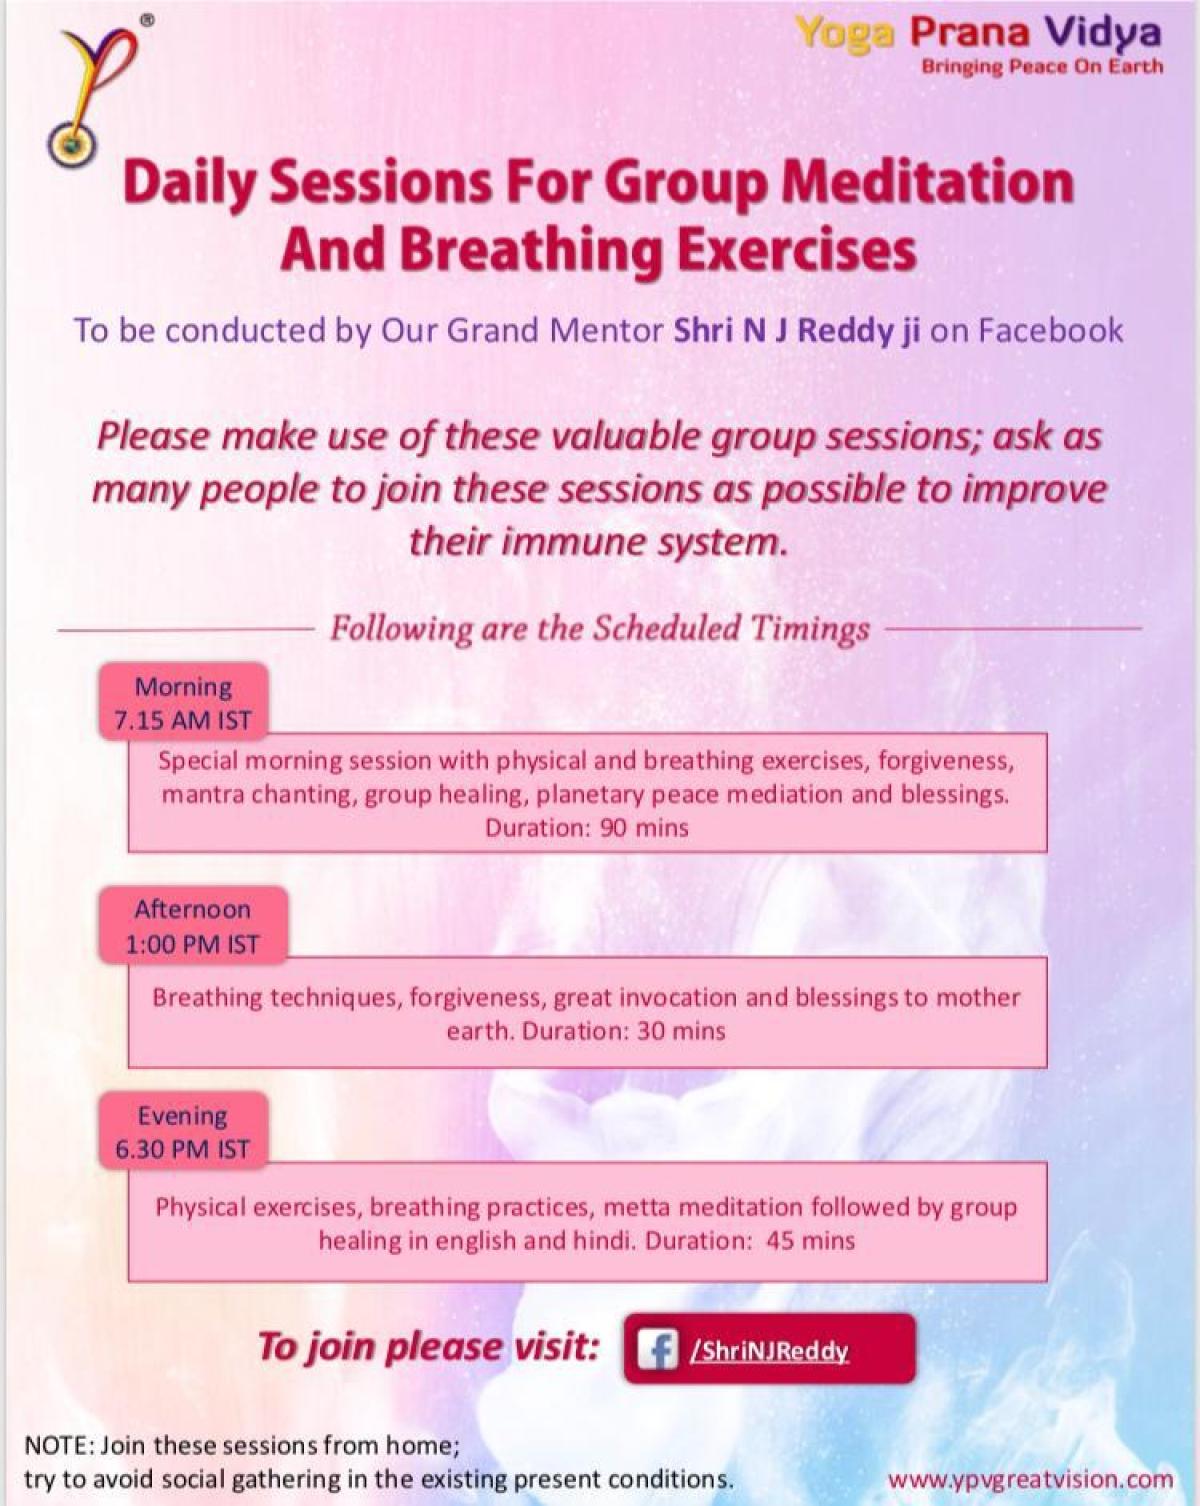 What is Rhythmic Yogic Abdominal Breathing? How can it be done? What are the benefits?: Shri N J Reddy, founder of Yoga Prana Vidya Sadhana